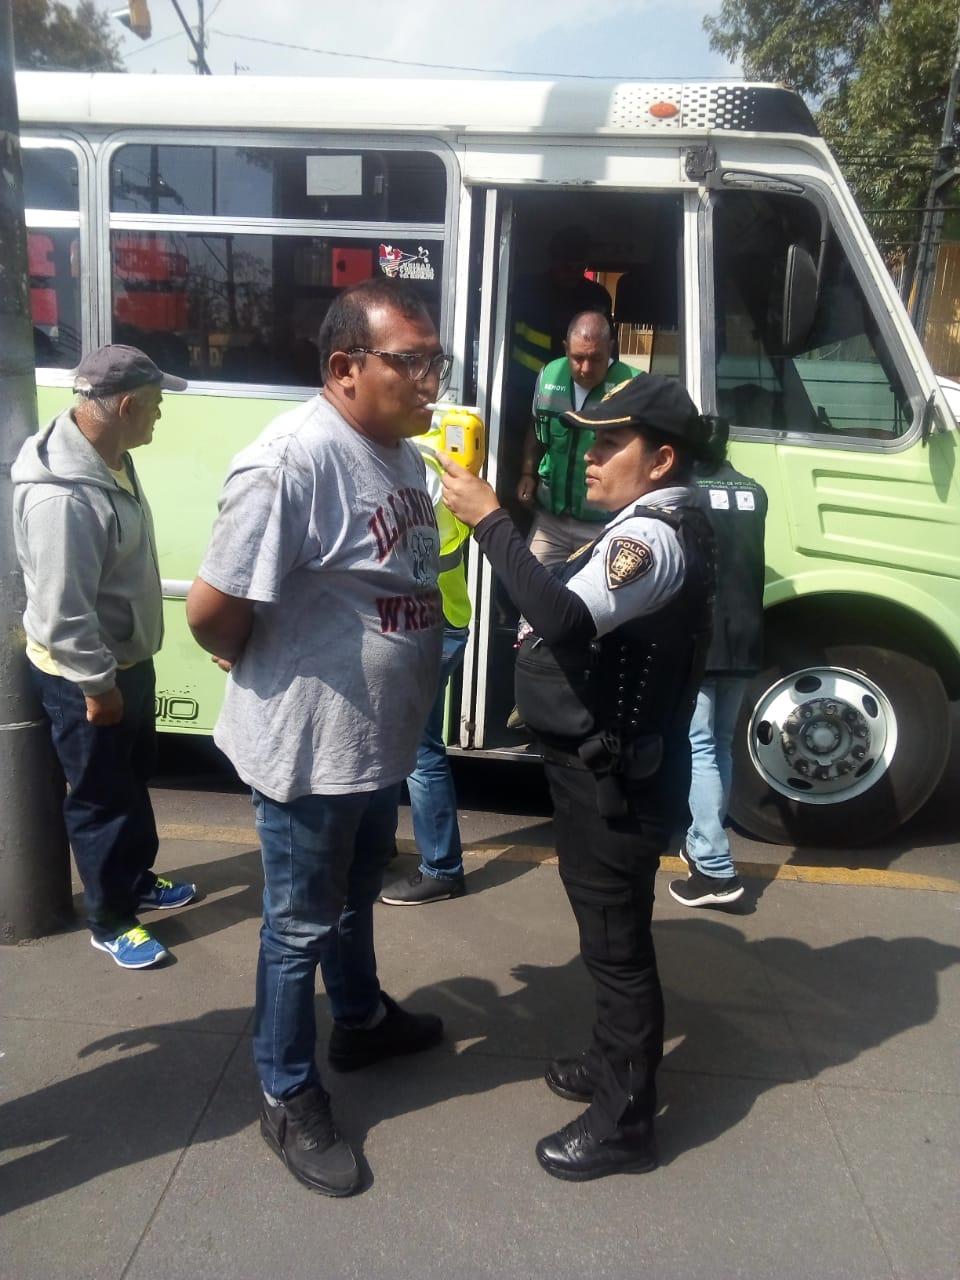 SSC realiza pruebas de alcoholemia a conductores del transporte público de la Ruta 49